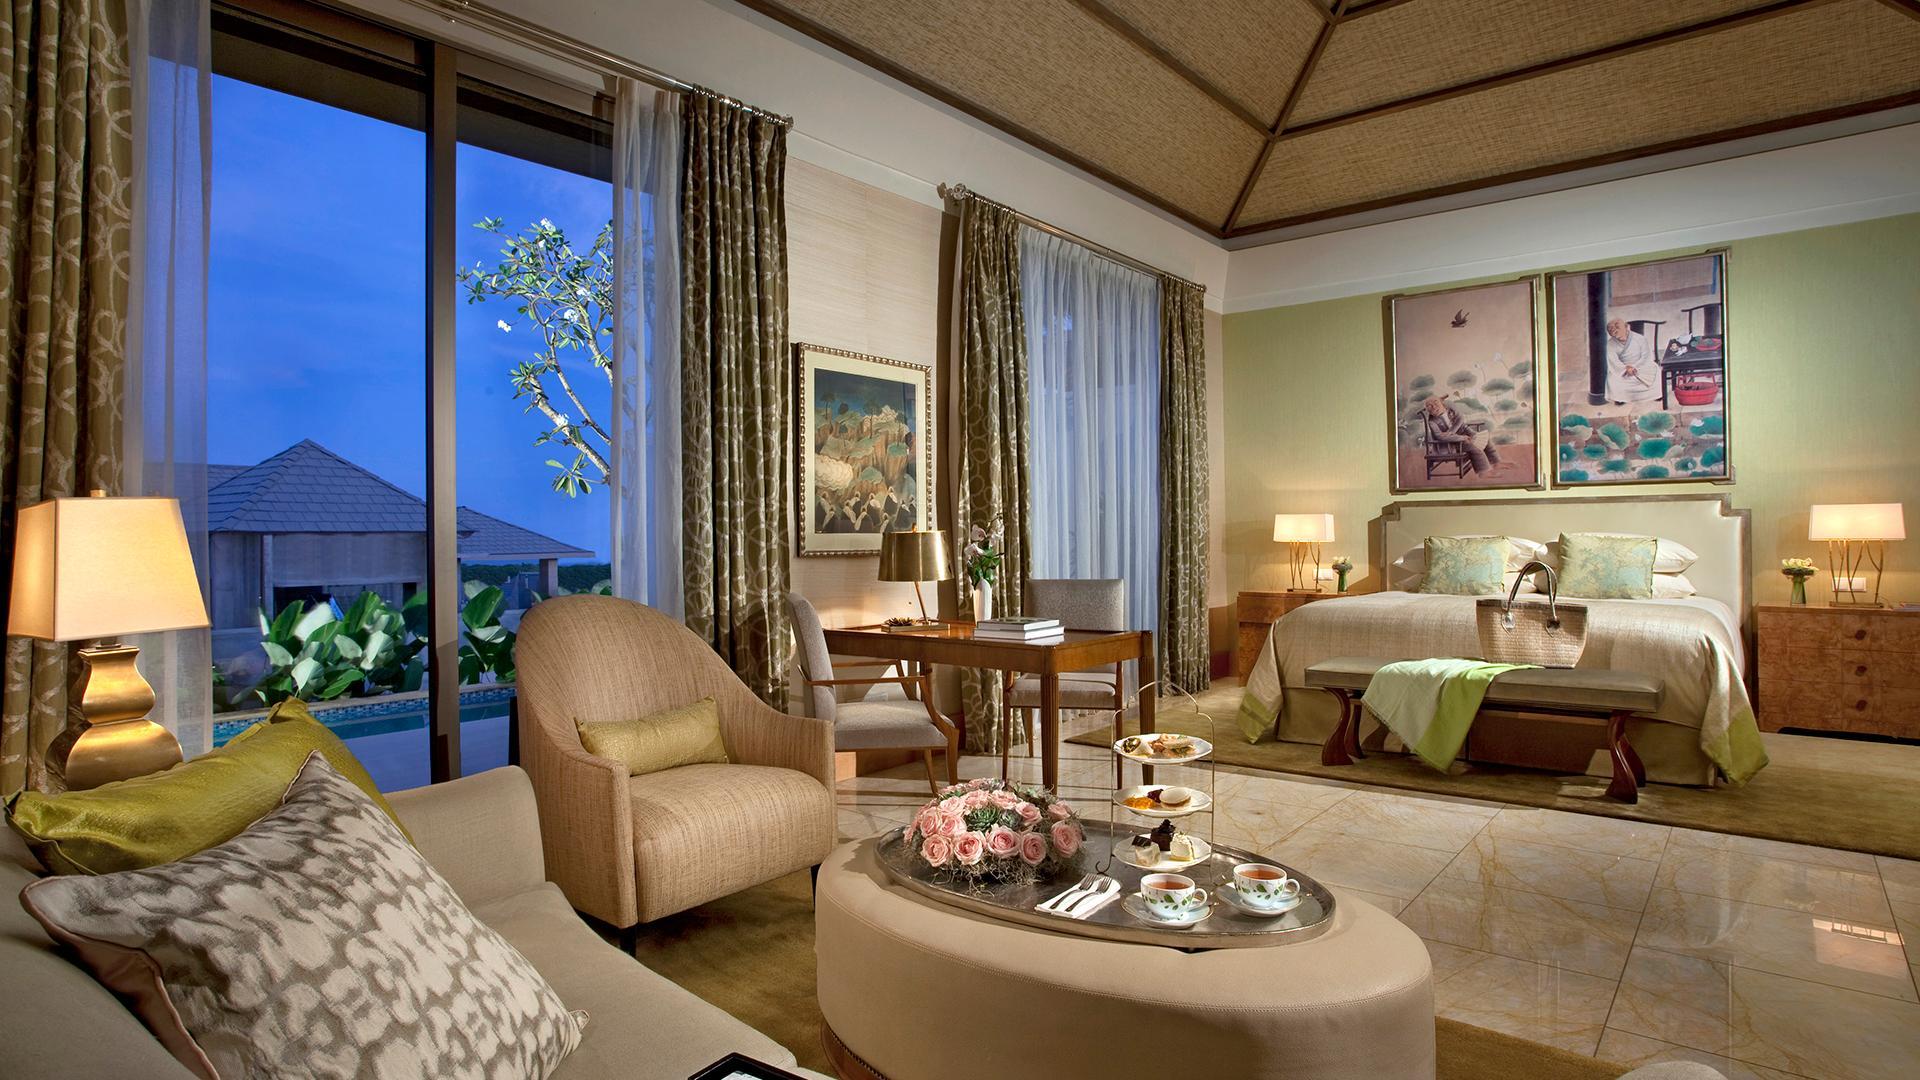 One Bedroom Ocean Pool Villa image 1 at Mulia Villas by Kabupaten Badung, Bali, Indonesia